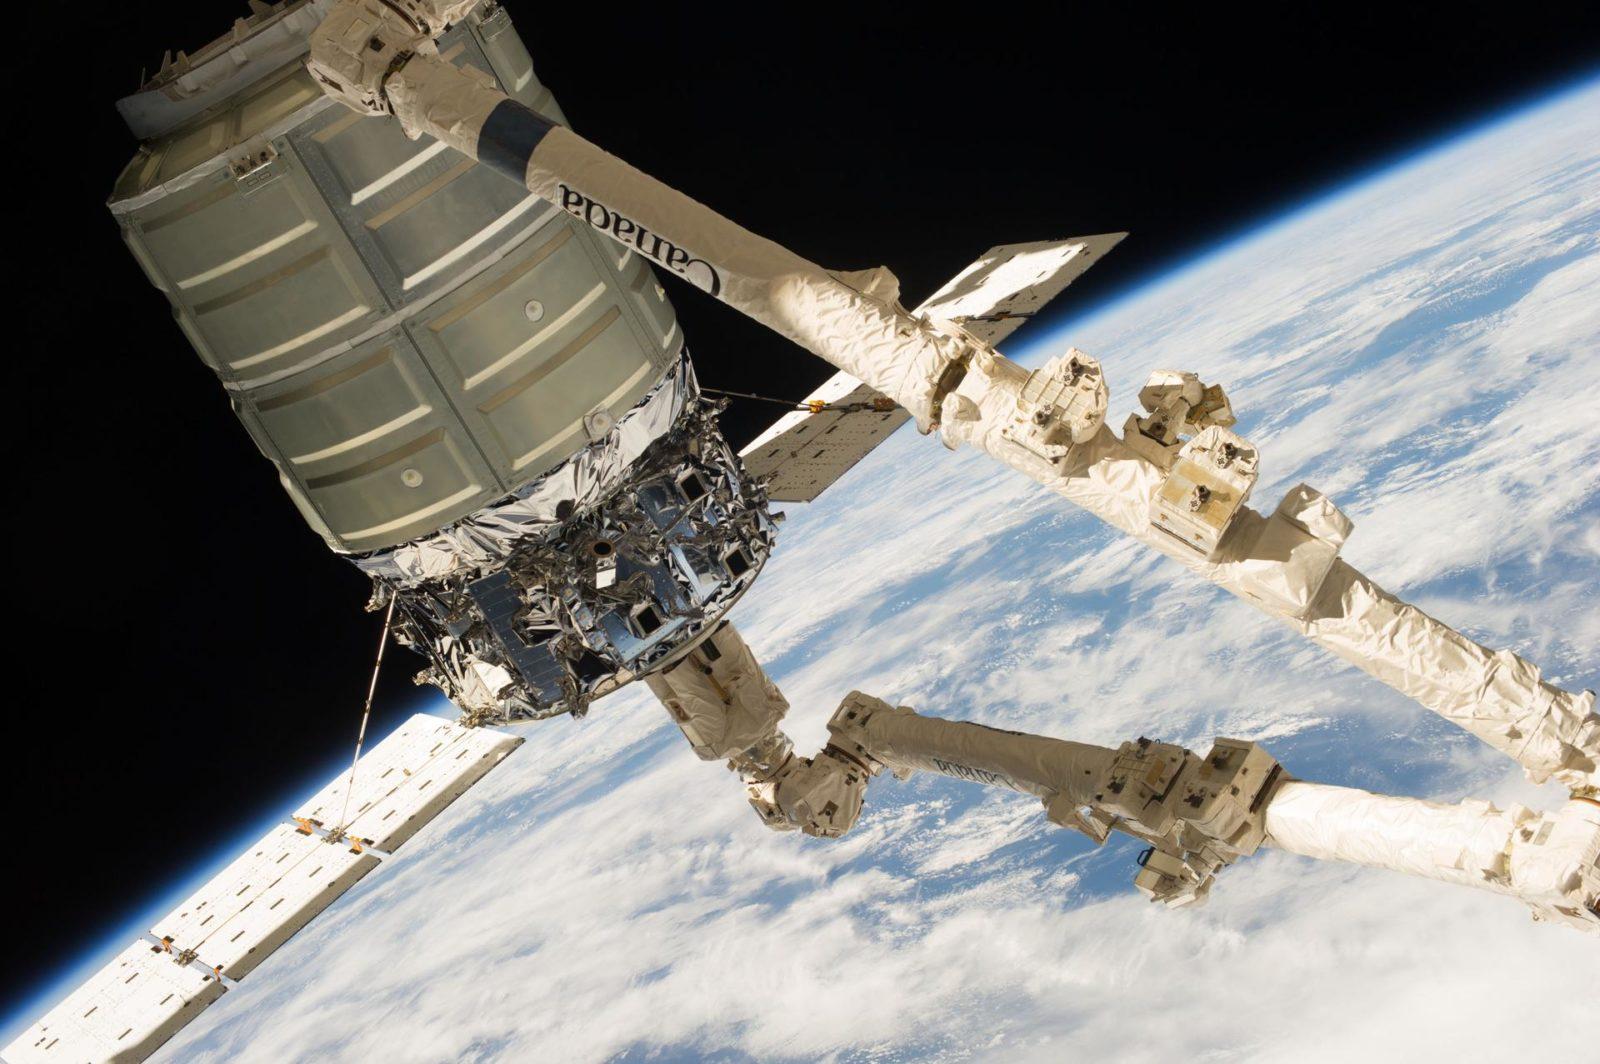 Cygnus Capture by Canadarm2